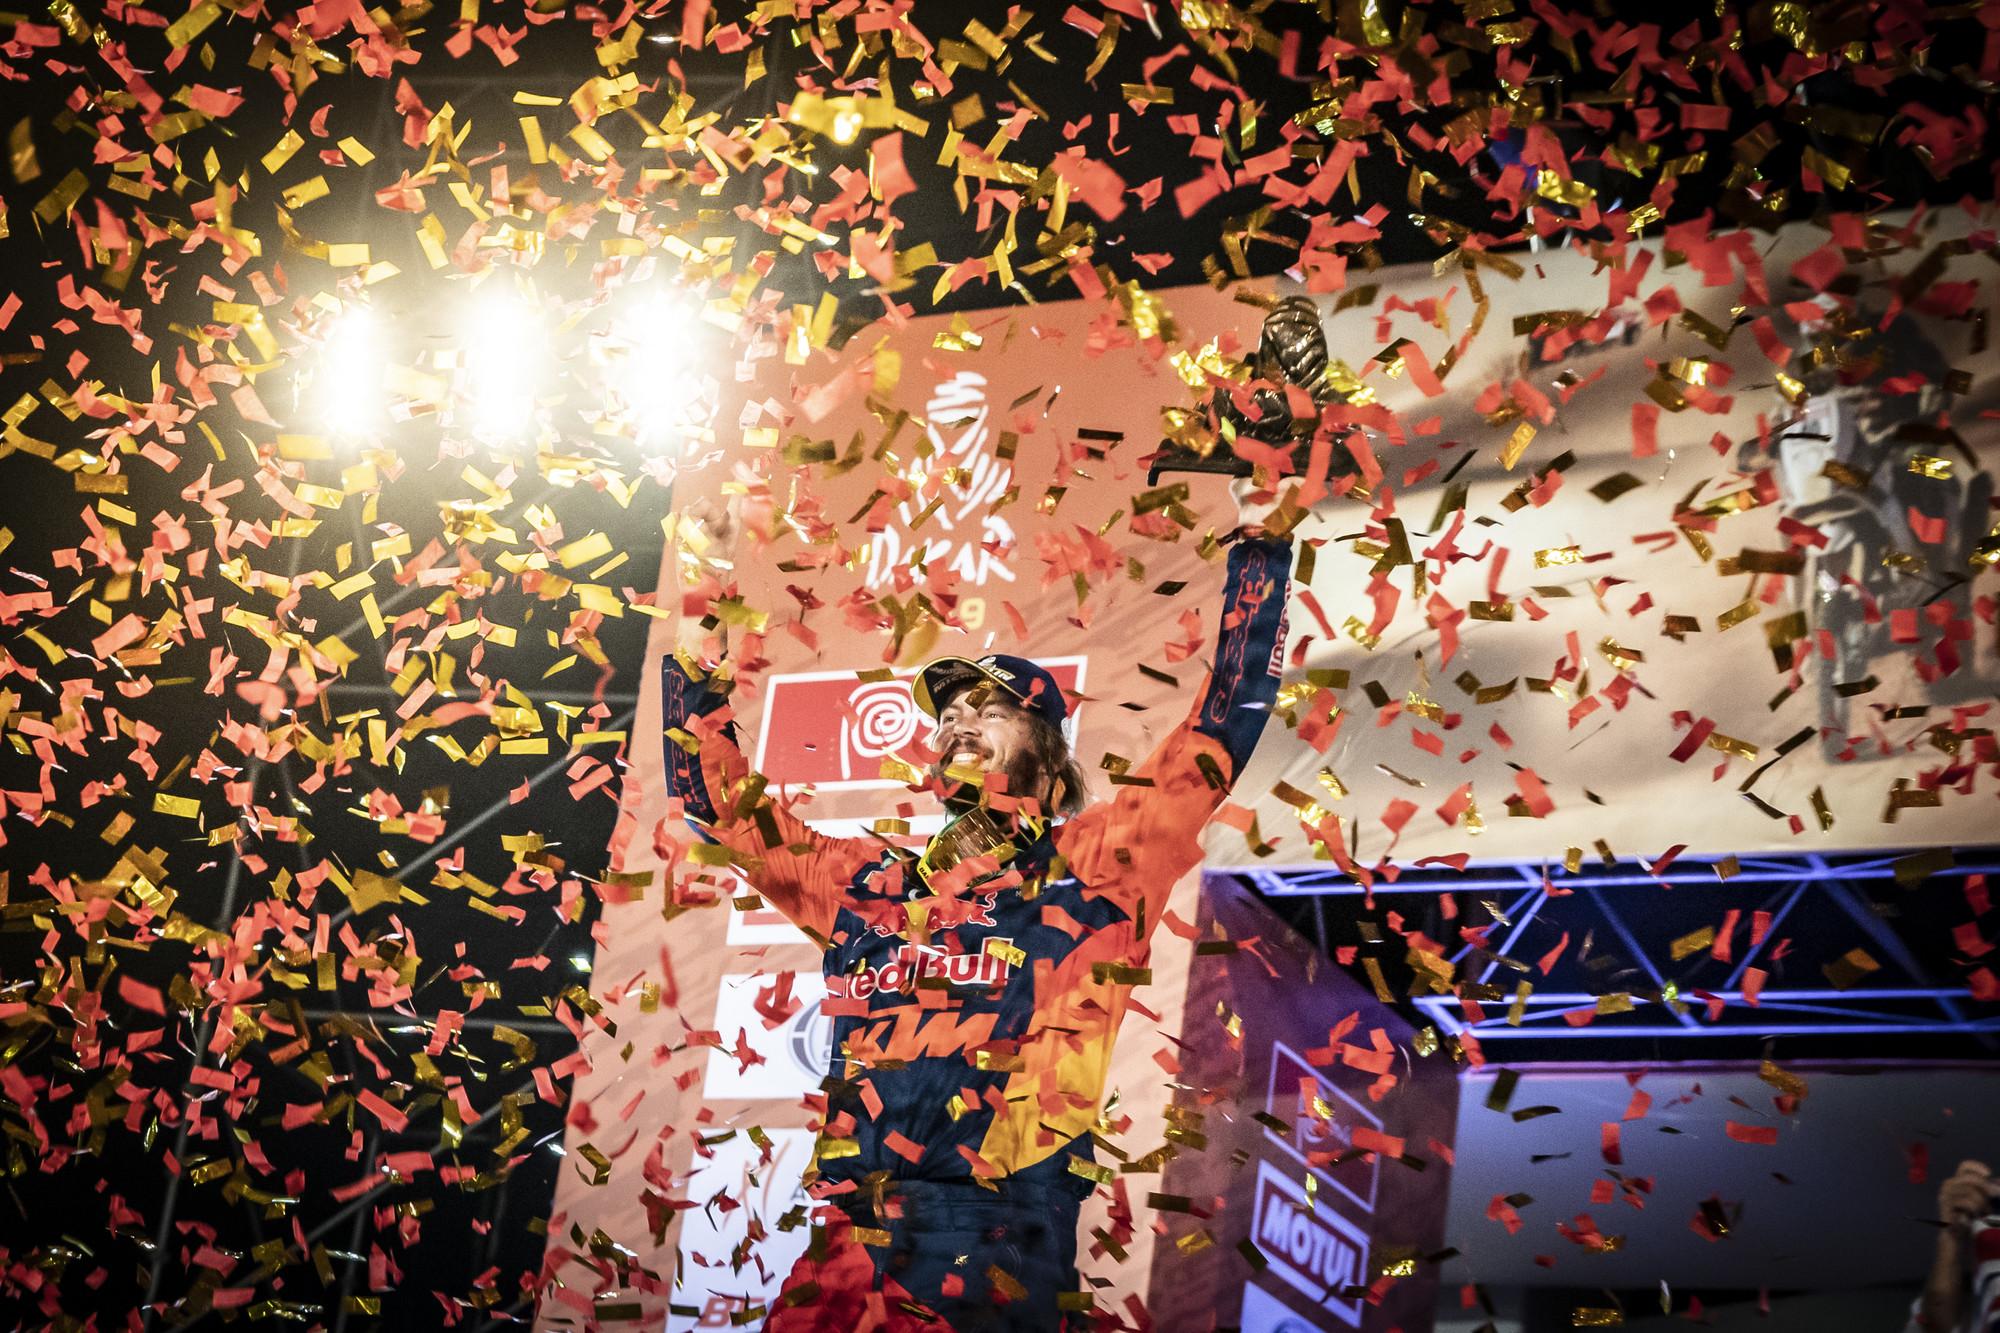 263417_toby.price_finish_Red Bull KTM Factory Racing_Dakar2019_479.jpg